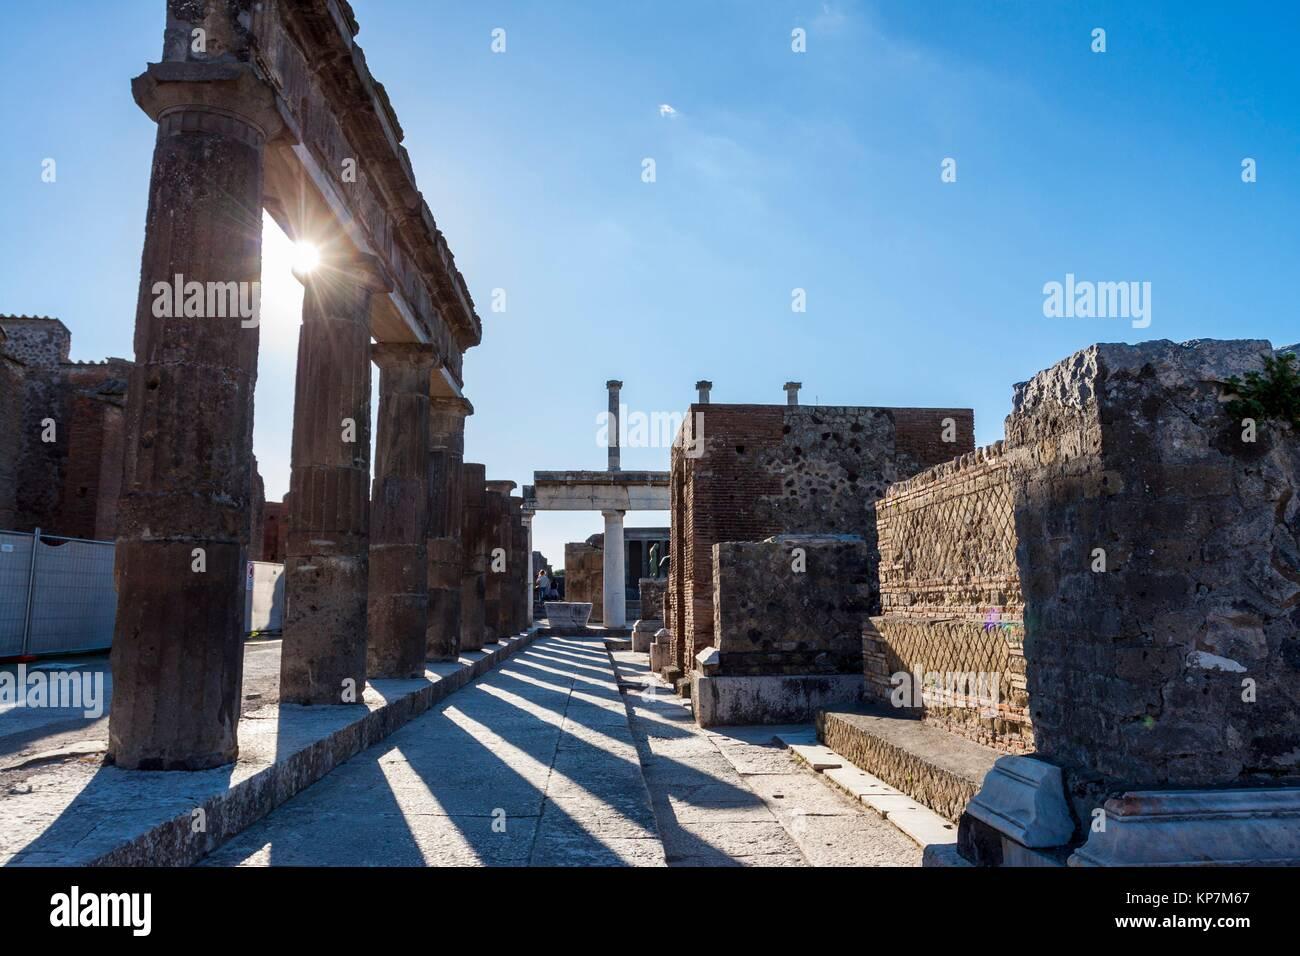 Ruins of a major important roman city. Pompeii, Campania. Italy - Stock Image